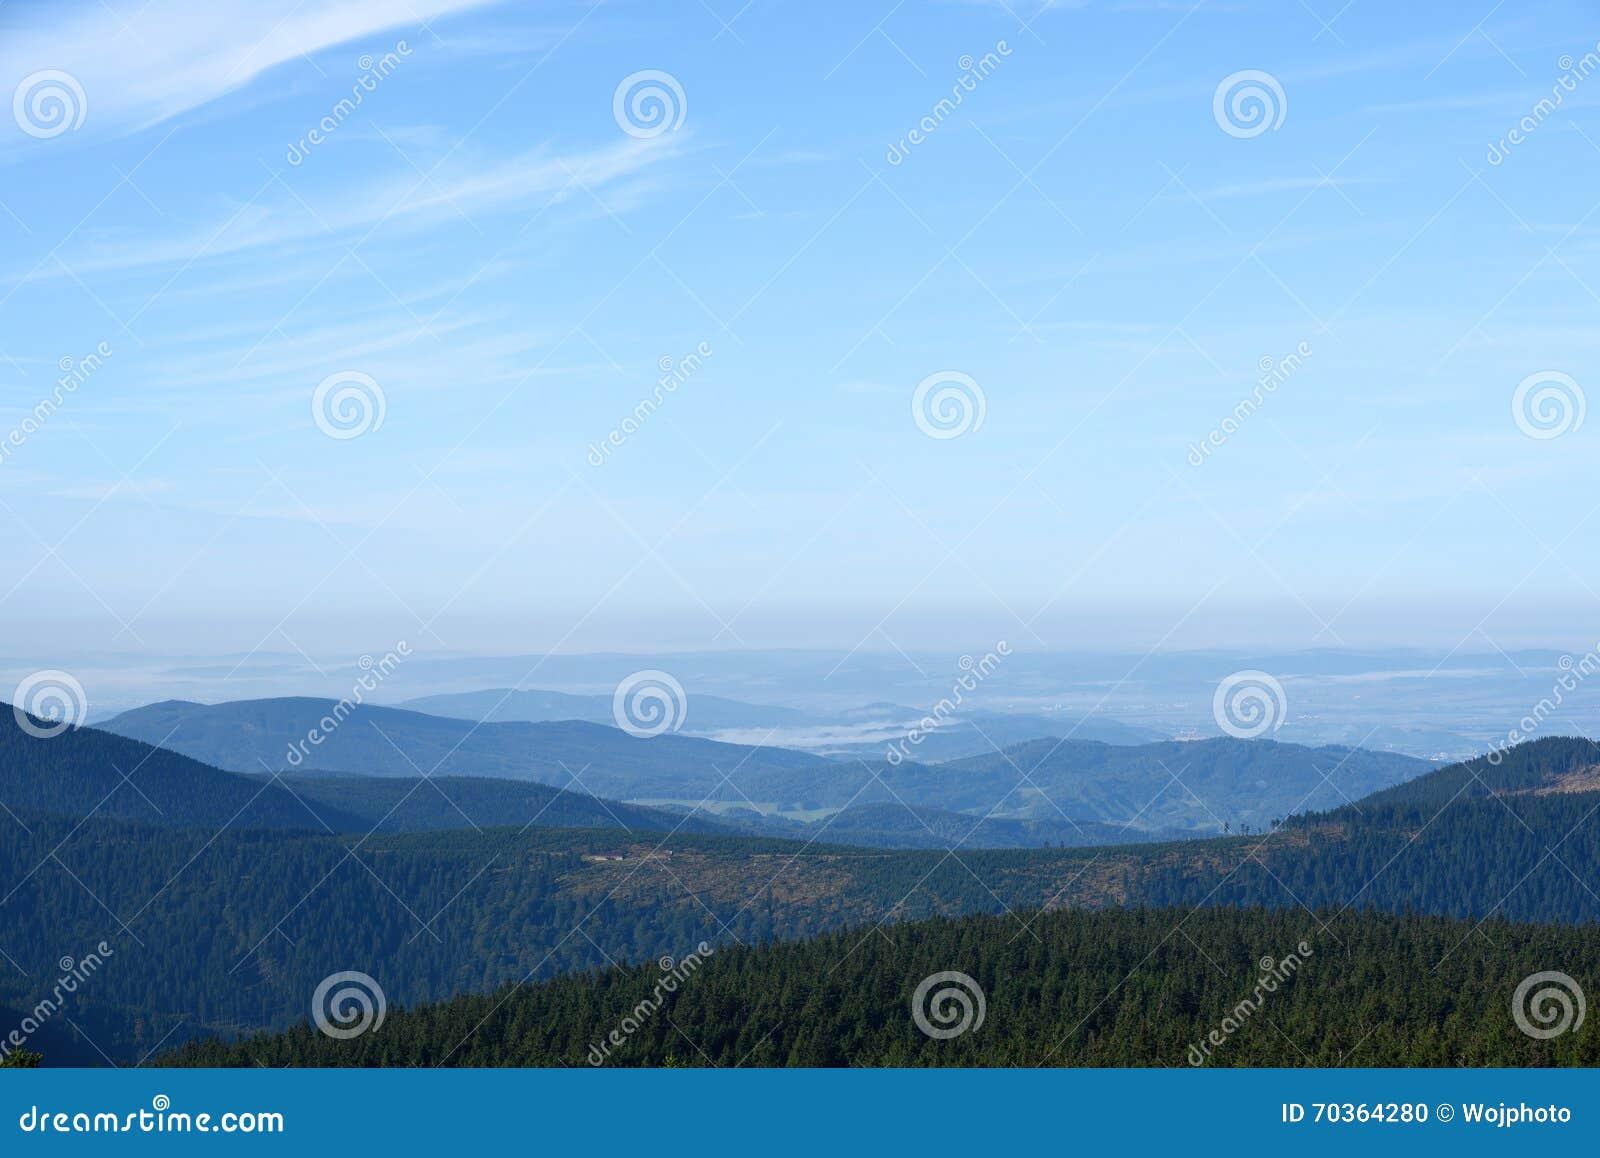 Distant hills and valleys landscape